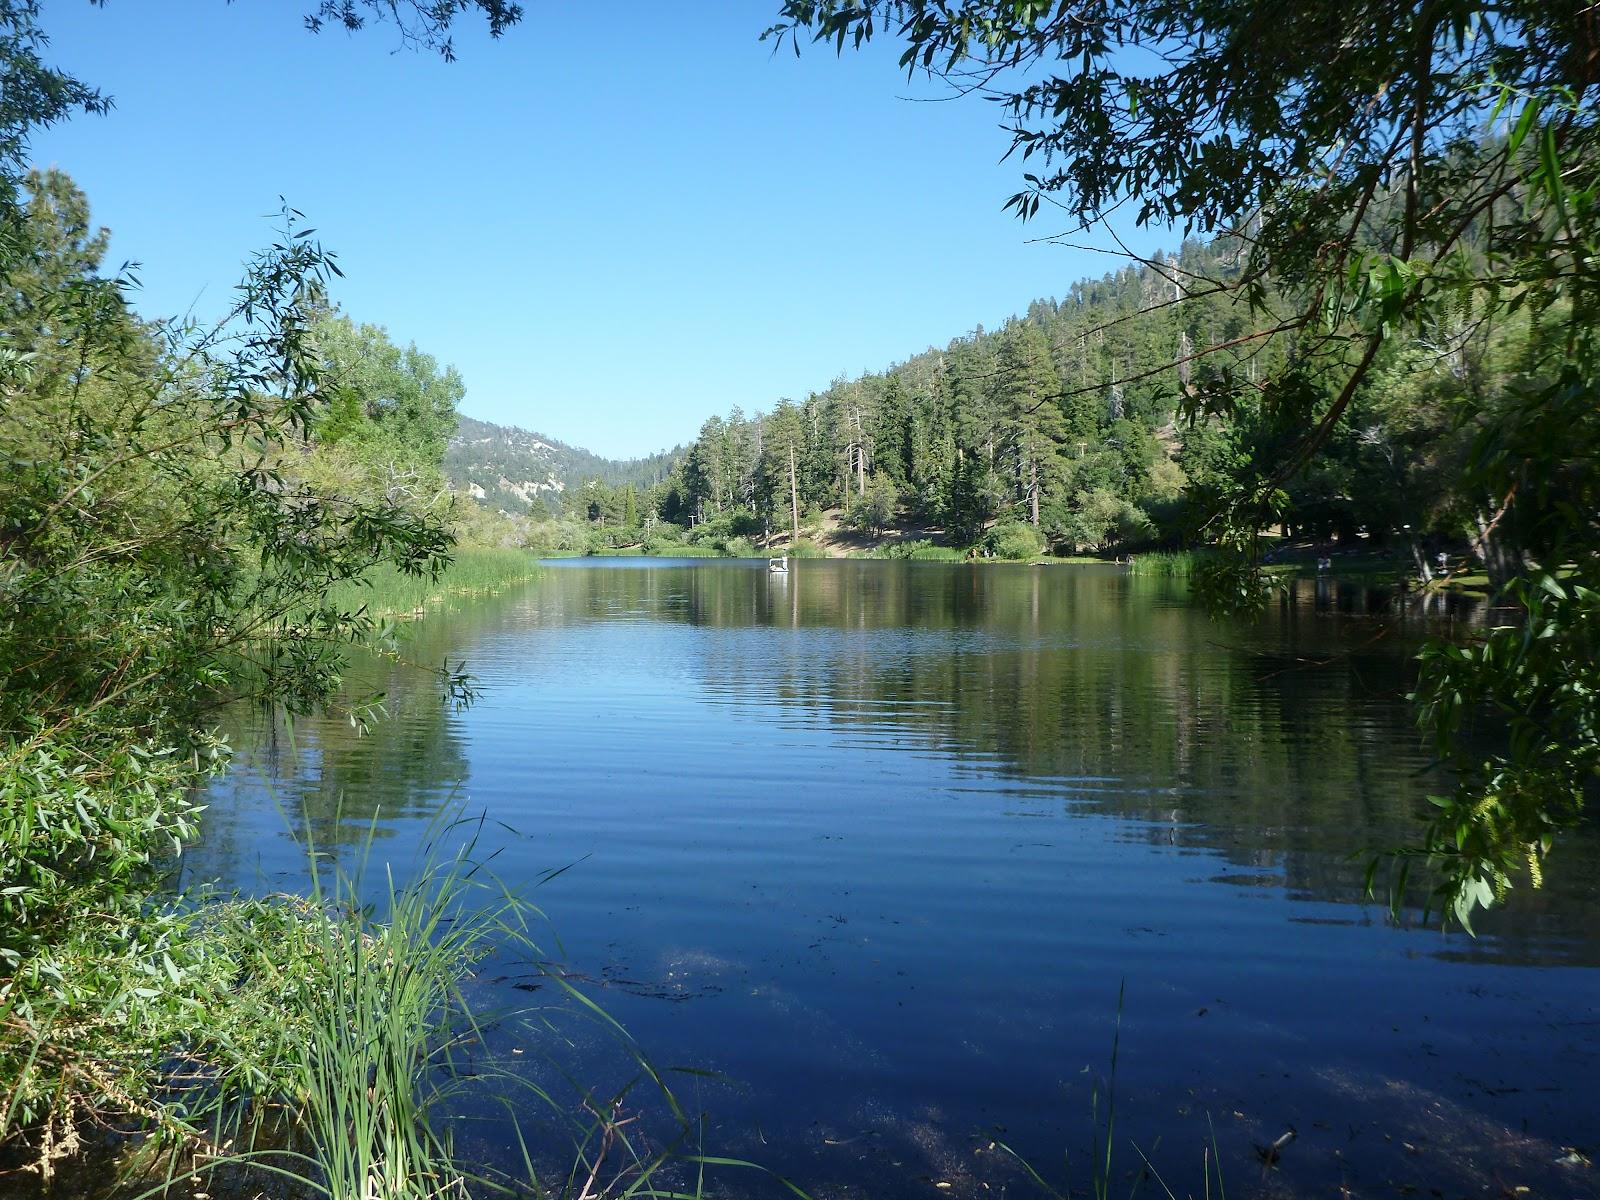 California photos lake campground and jackson lake review for Jackson lake fishing